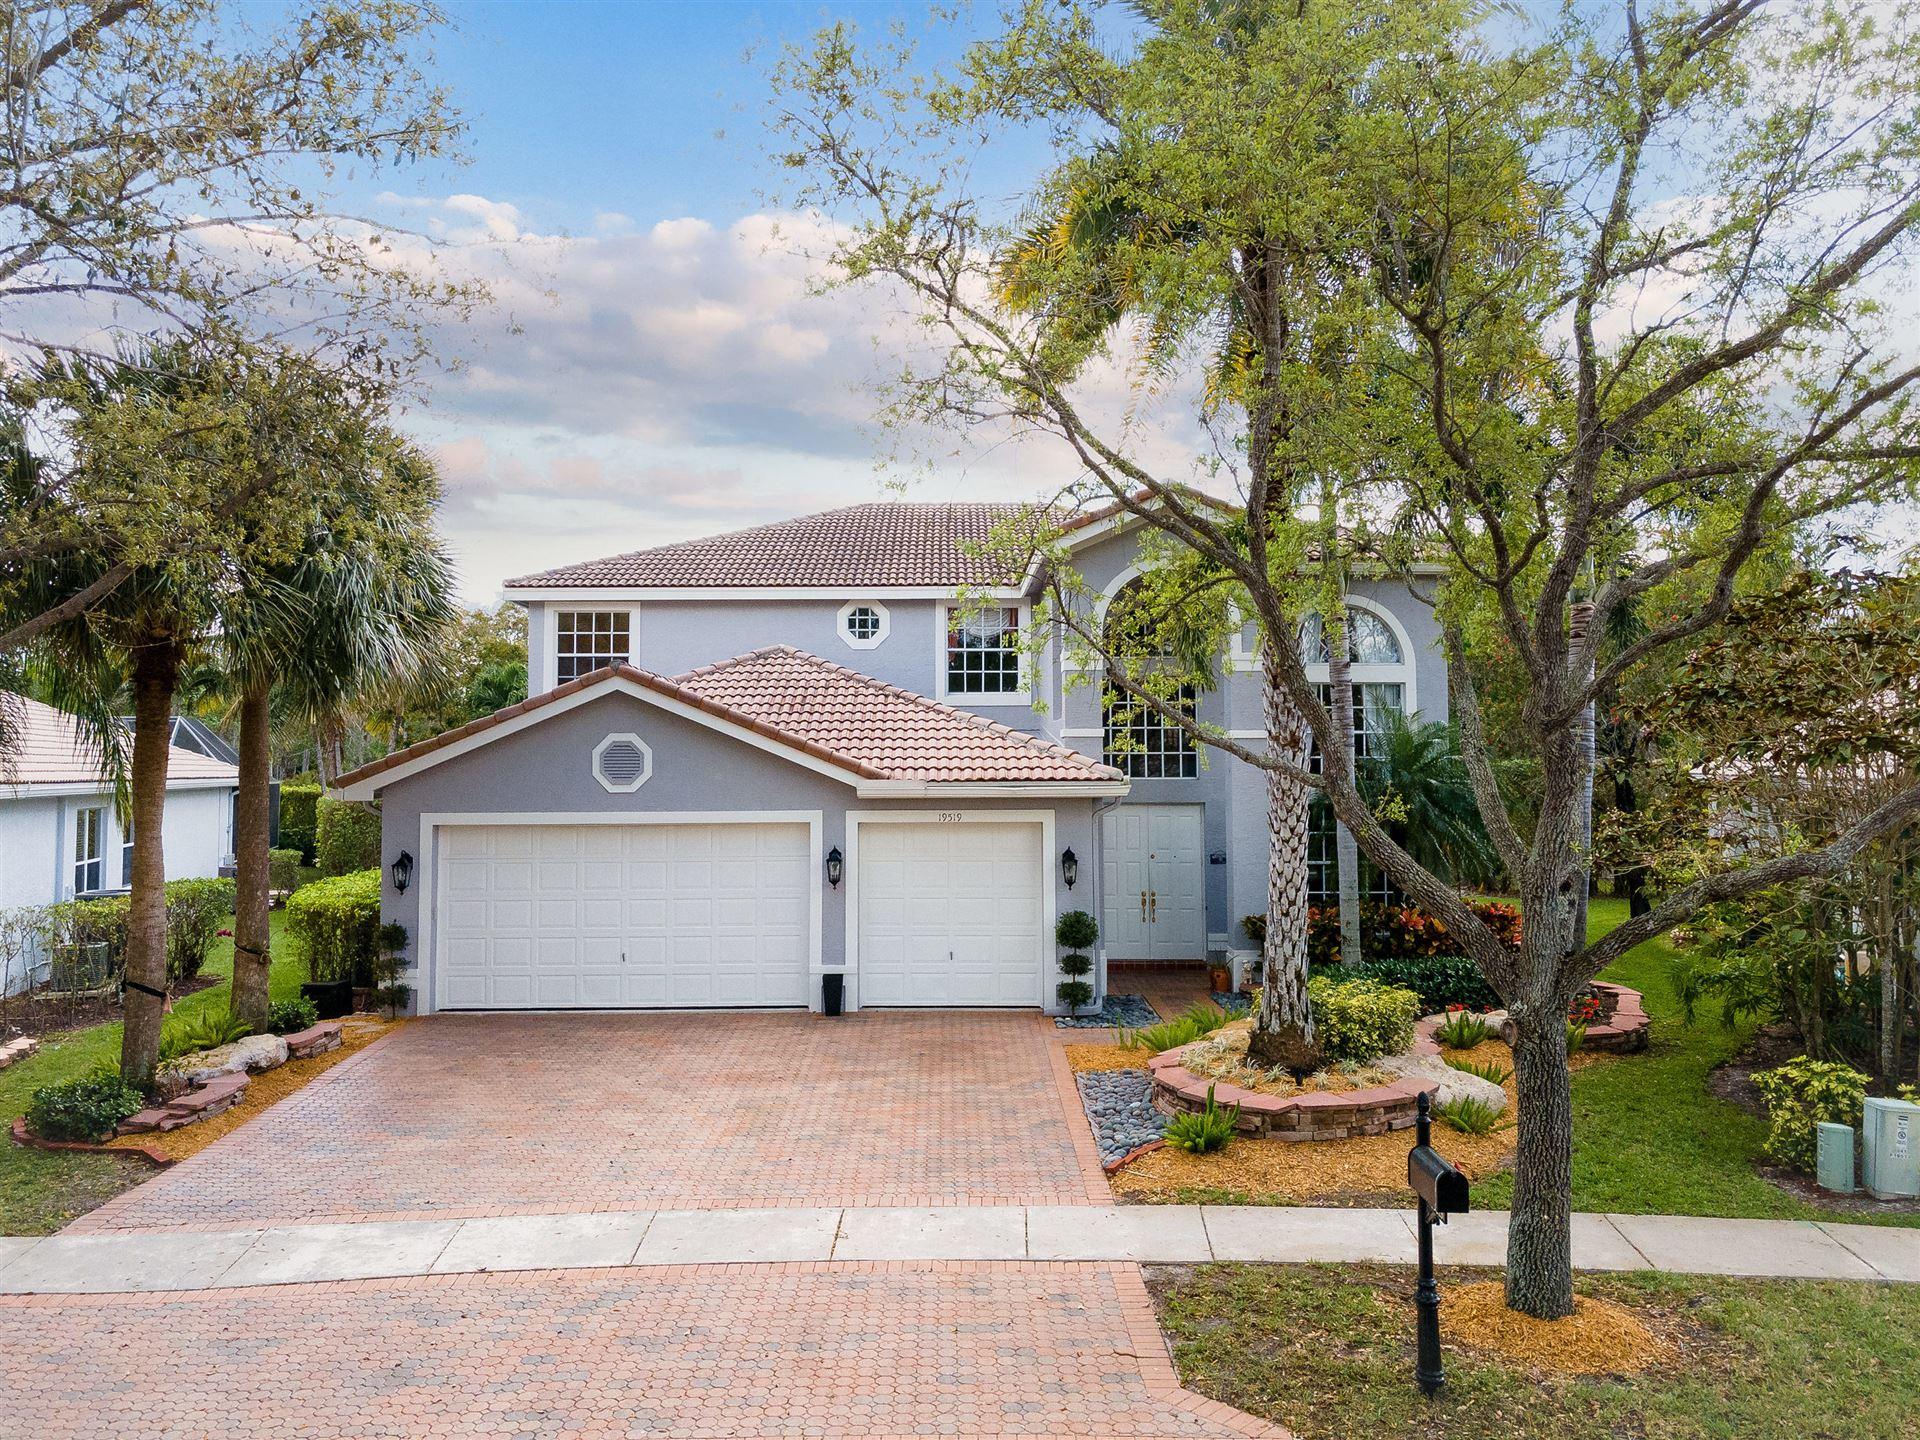 19519 Estuary Drive, Boca Raton, FL 33498 - #: RX-10697656